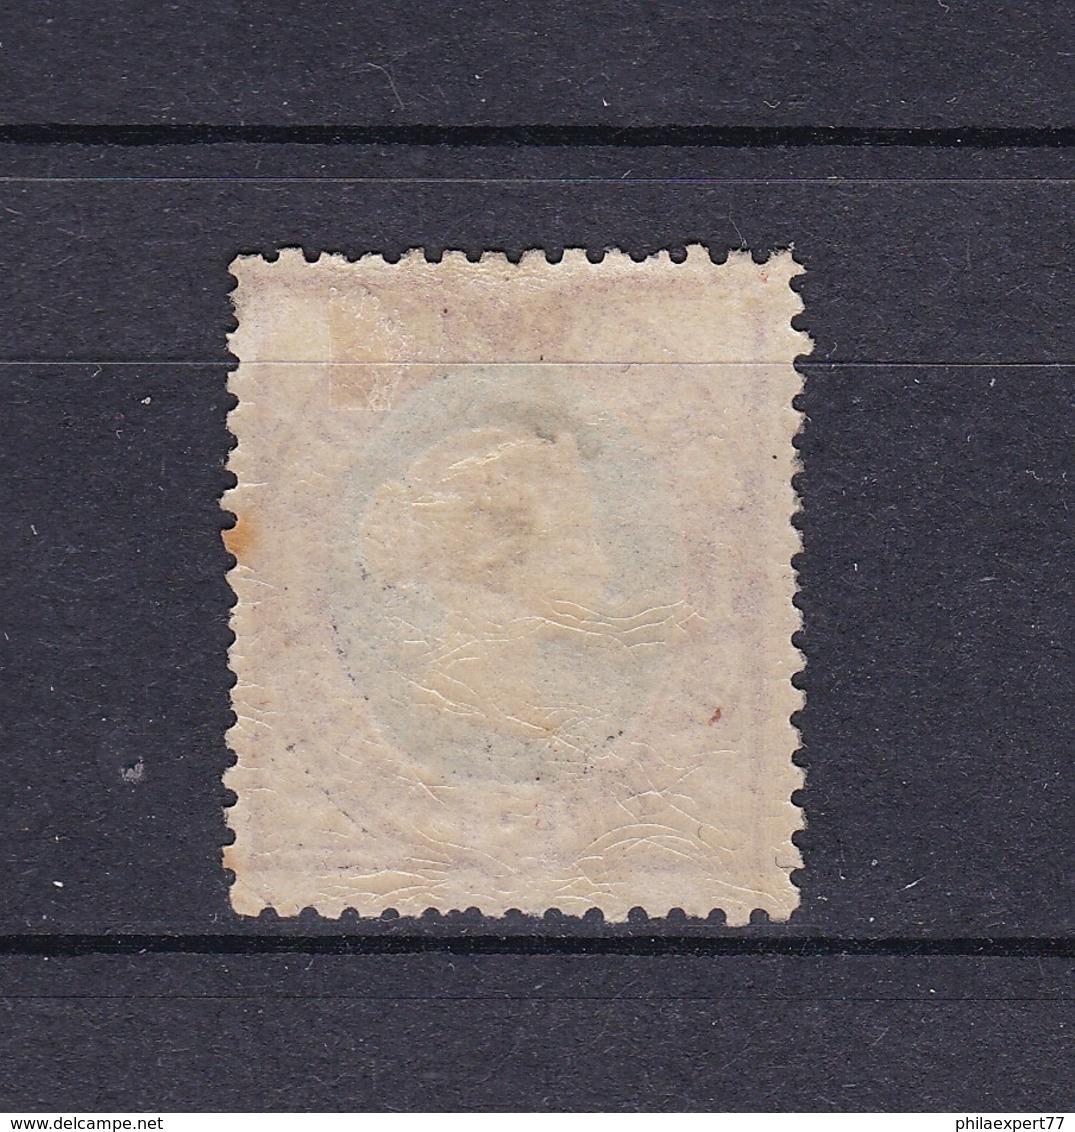 Helgoland - 1875 - Michel Nr. 11 - Helgoland